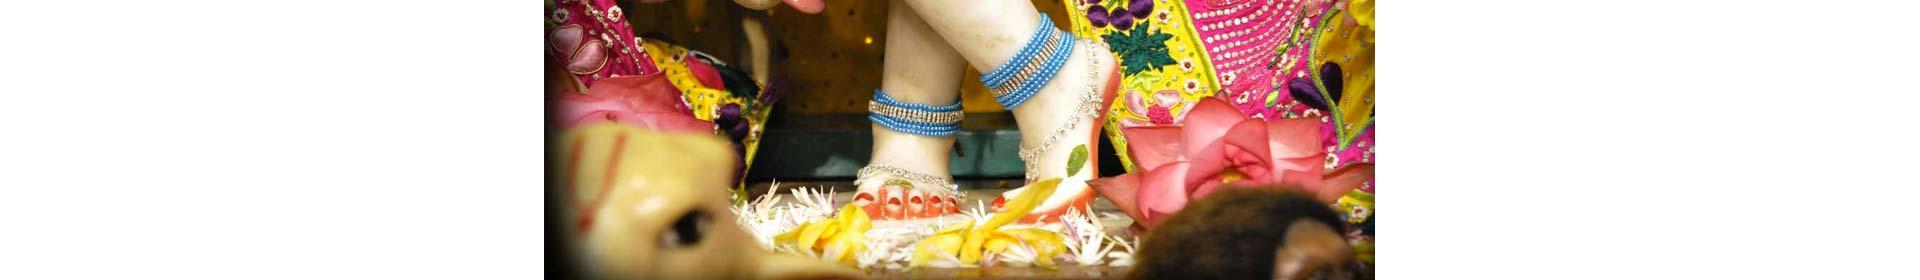 Manorama bowing to the lotus feet of the guru